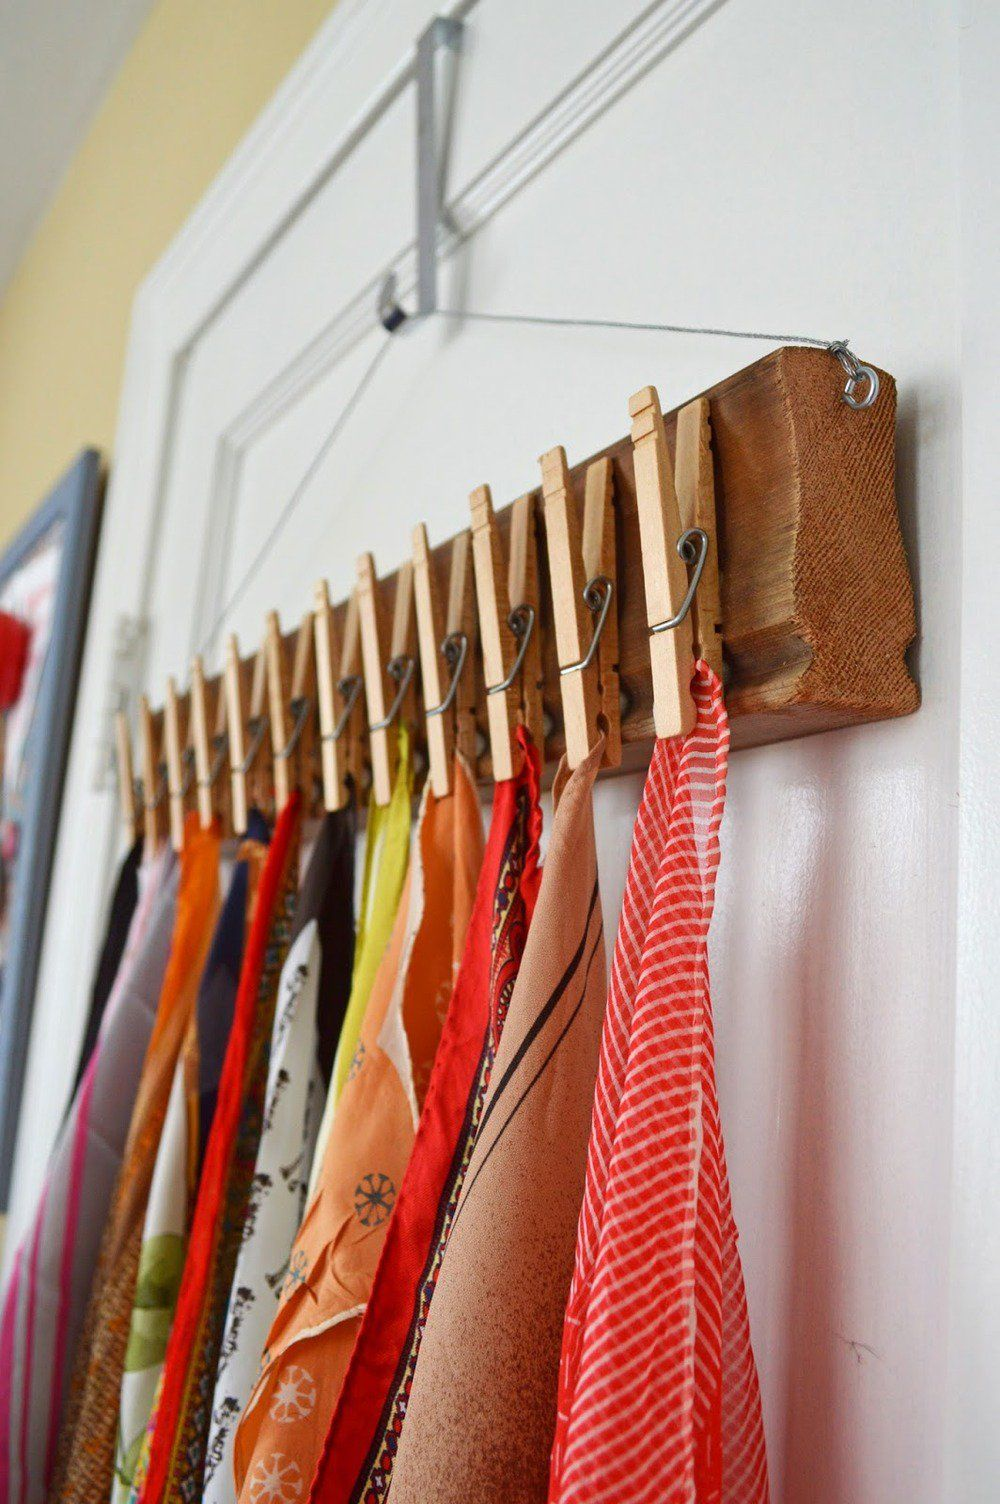 Ажурная кофта для пышных дам Схемы вязания 22